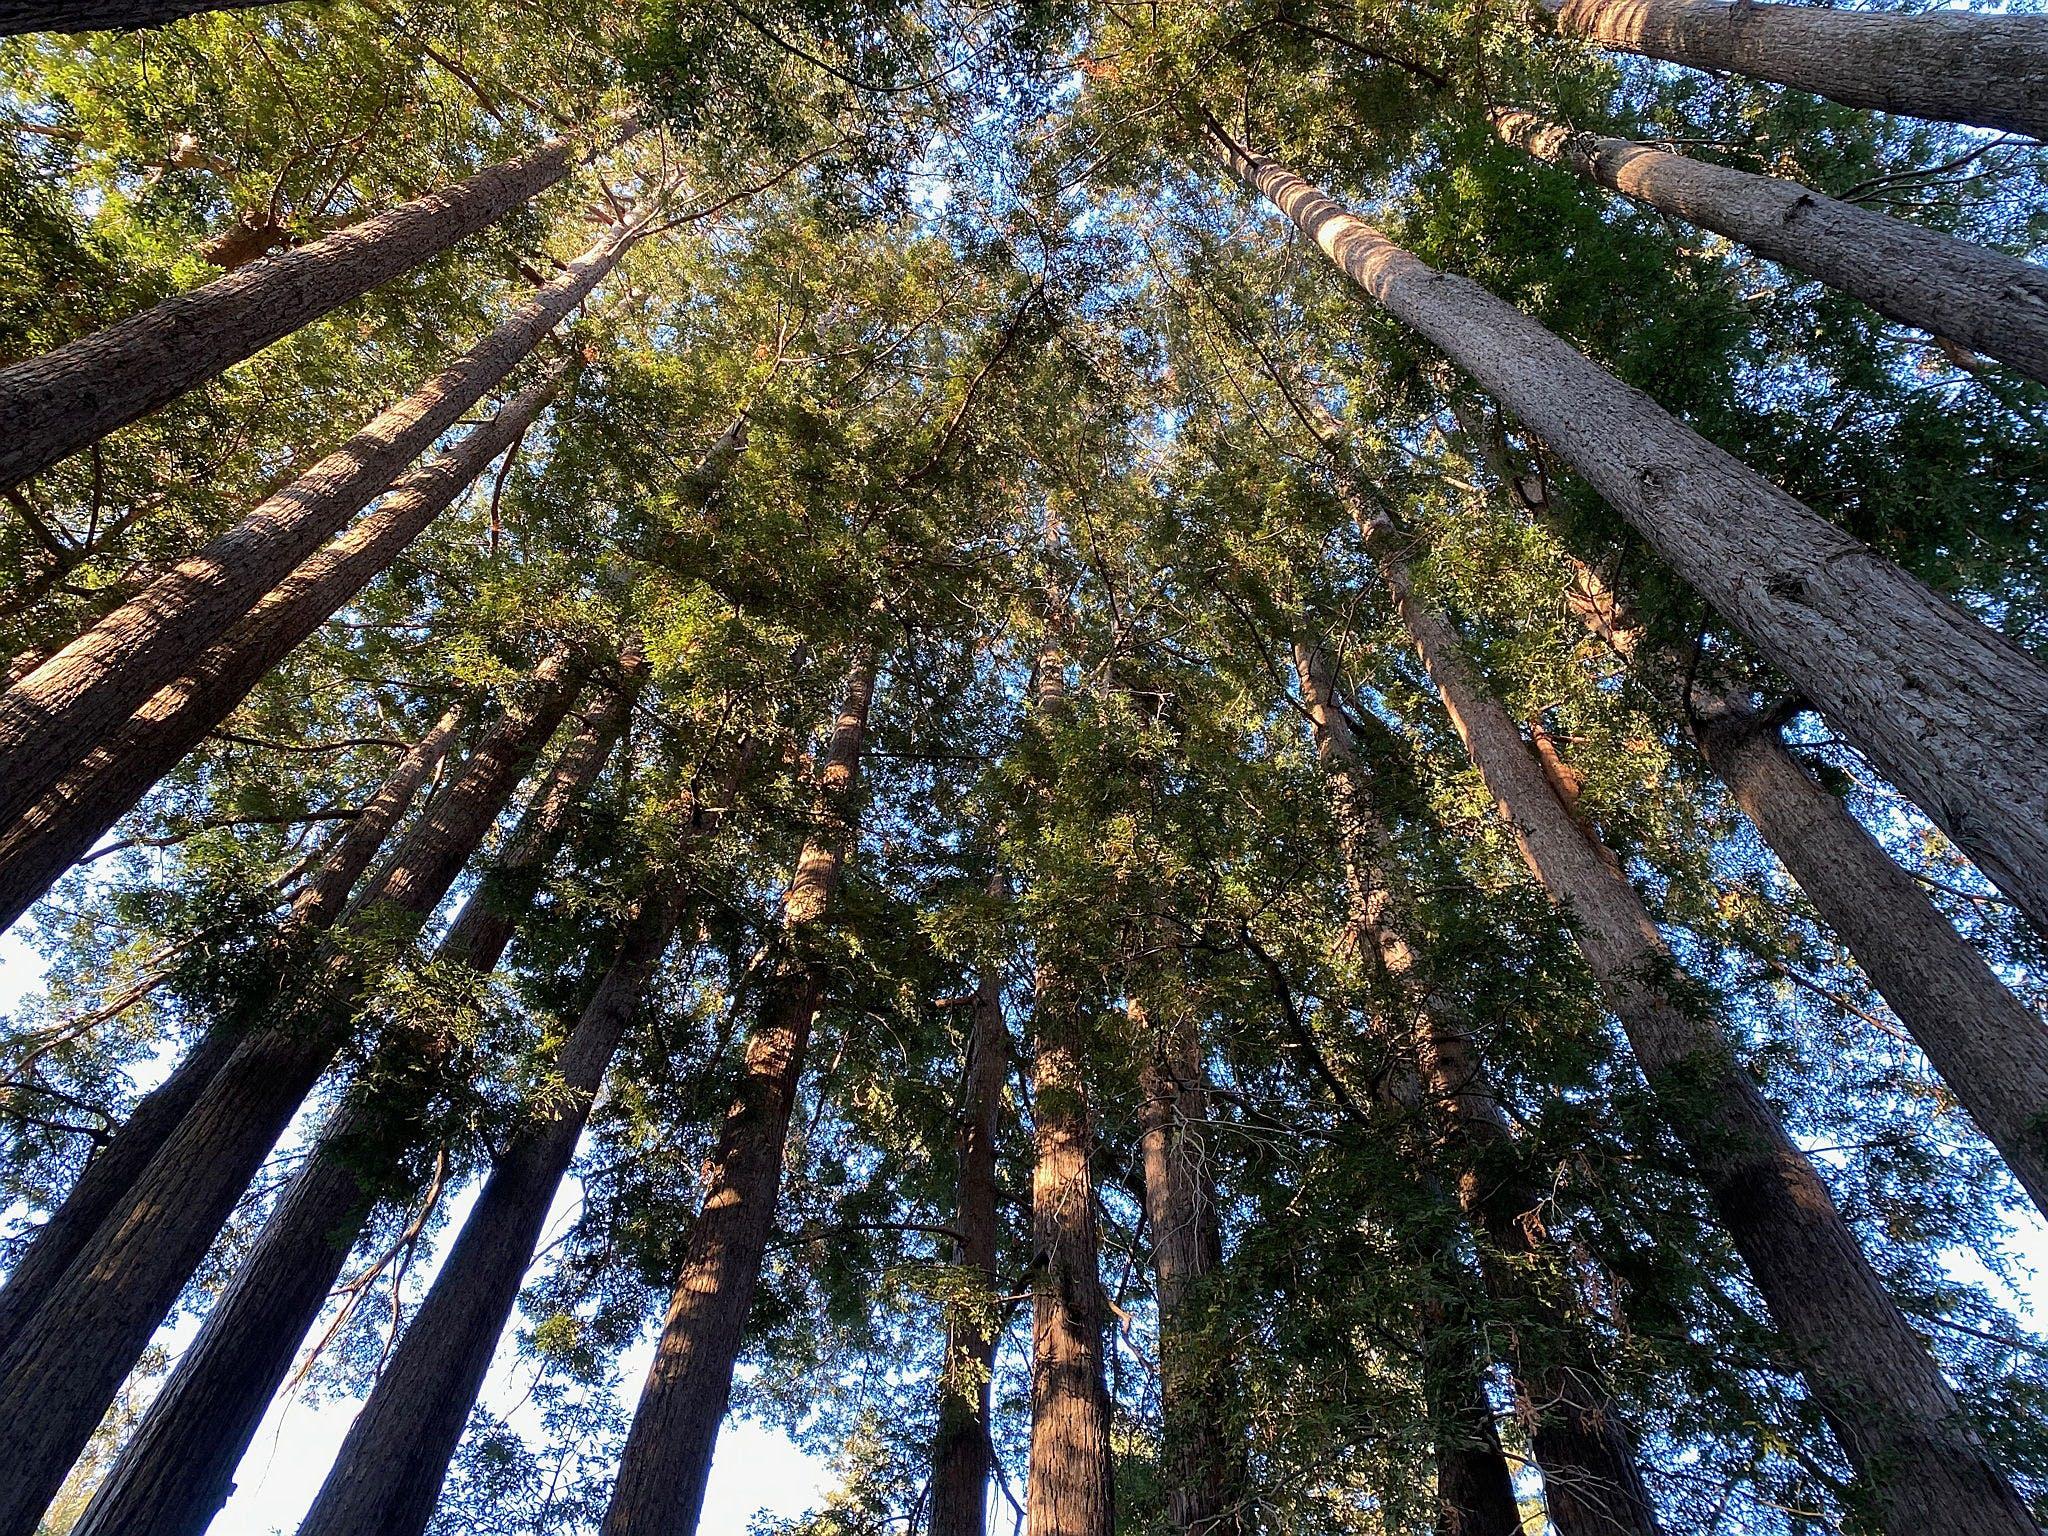 Hike redwoods at Sanborn County Park